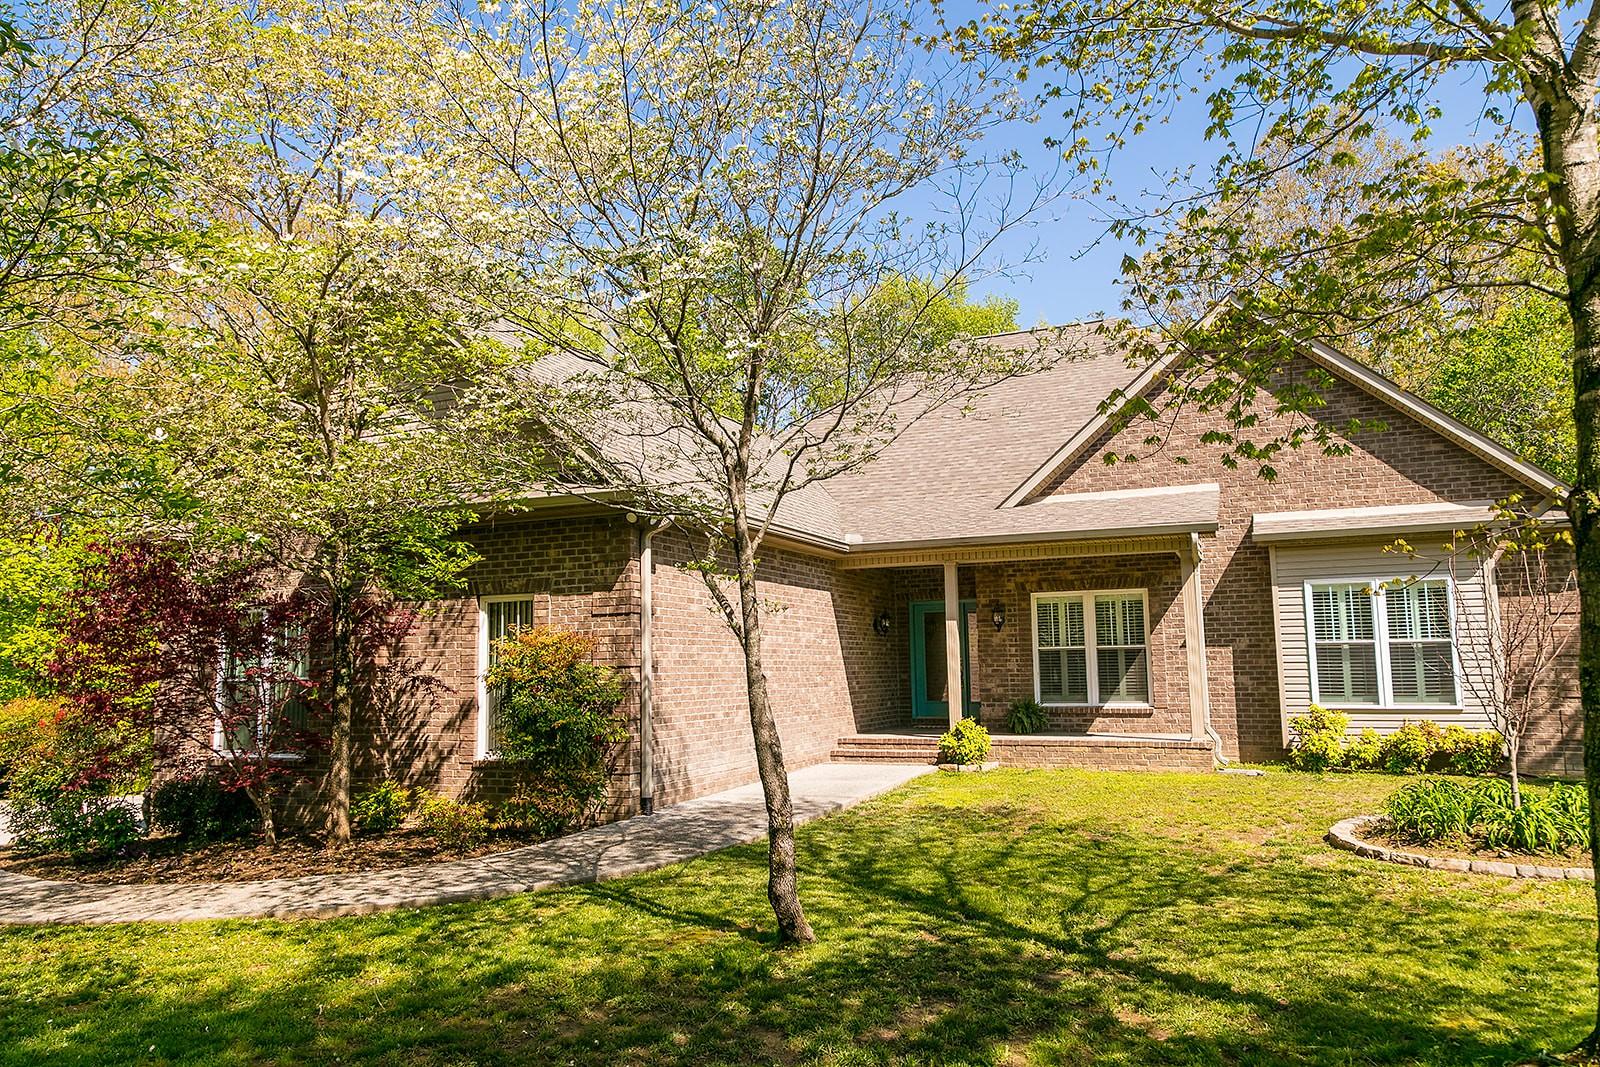 1051 Hall Cemetery Rd, Burns, TN 37029 - Burns, TN real estate listing